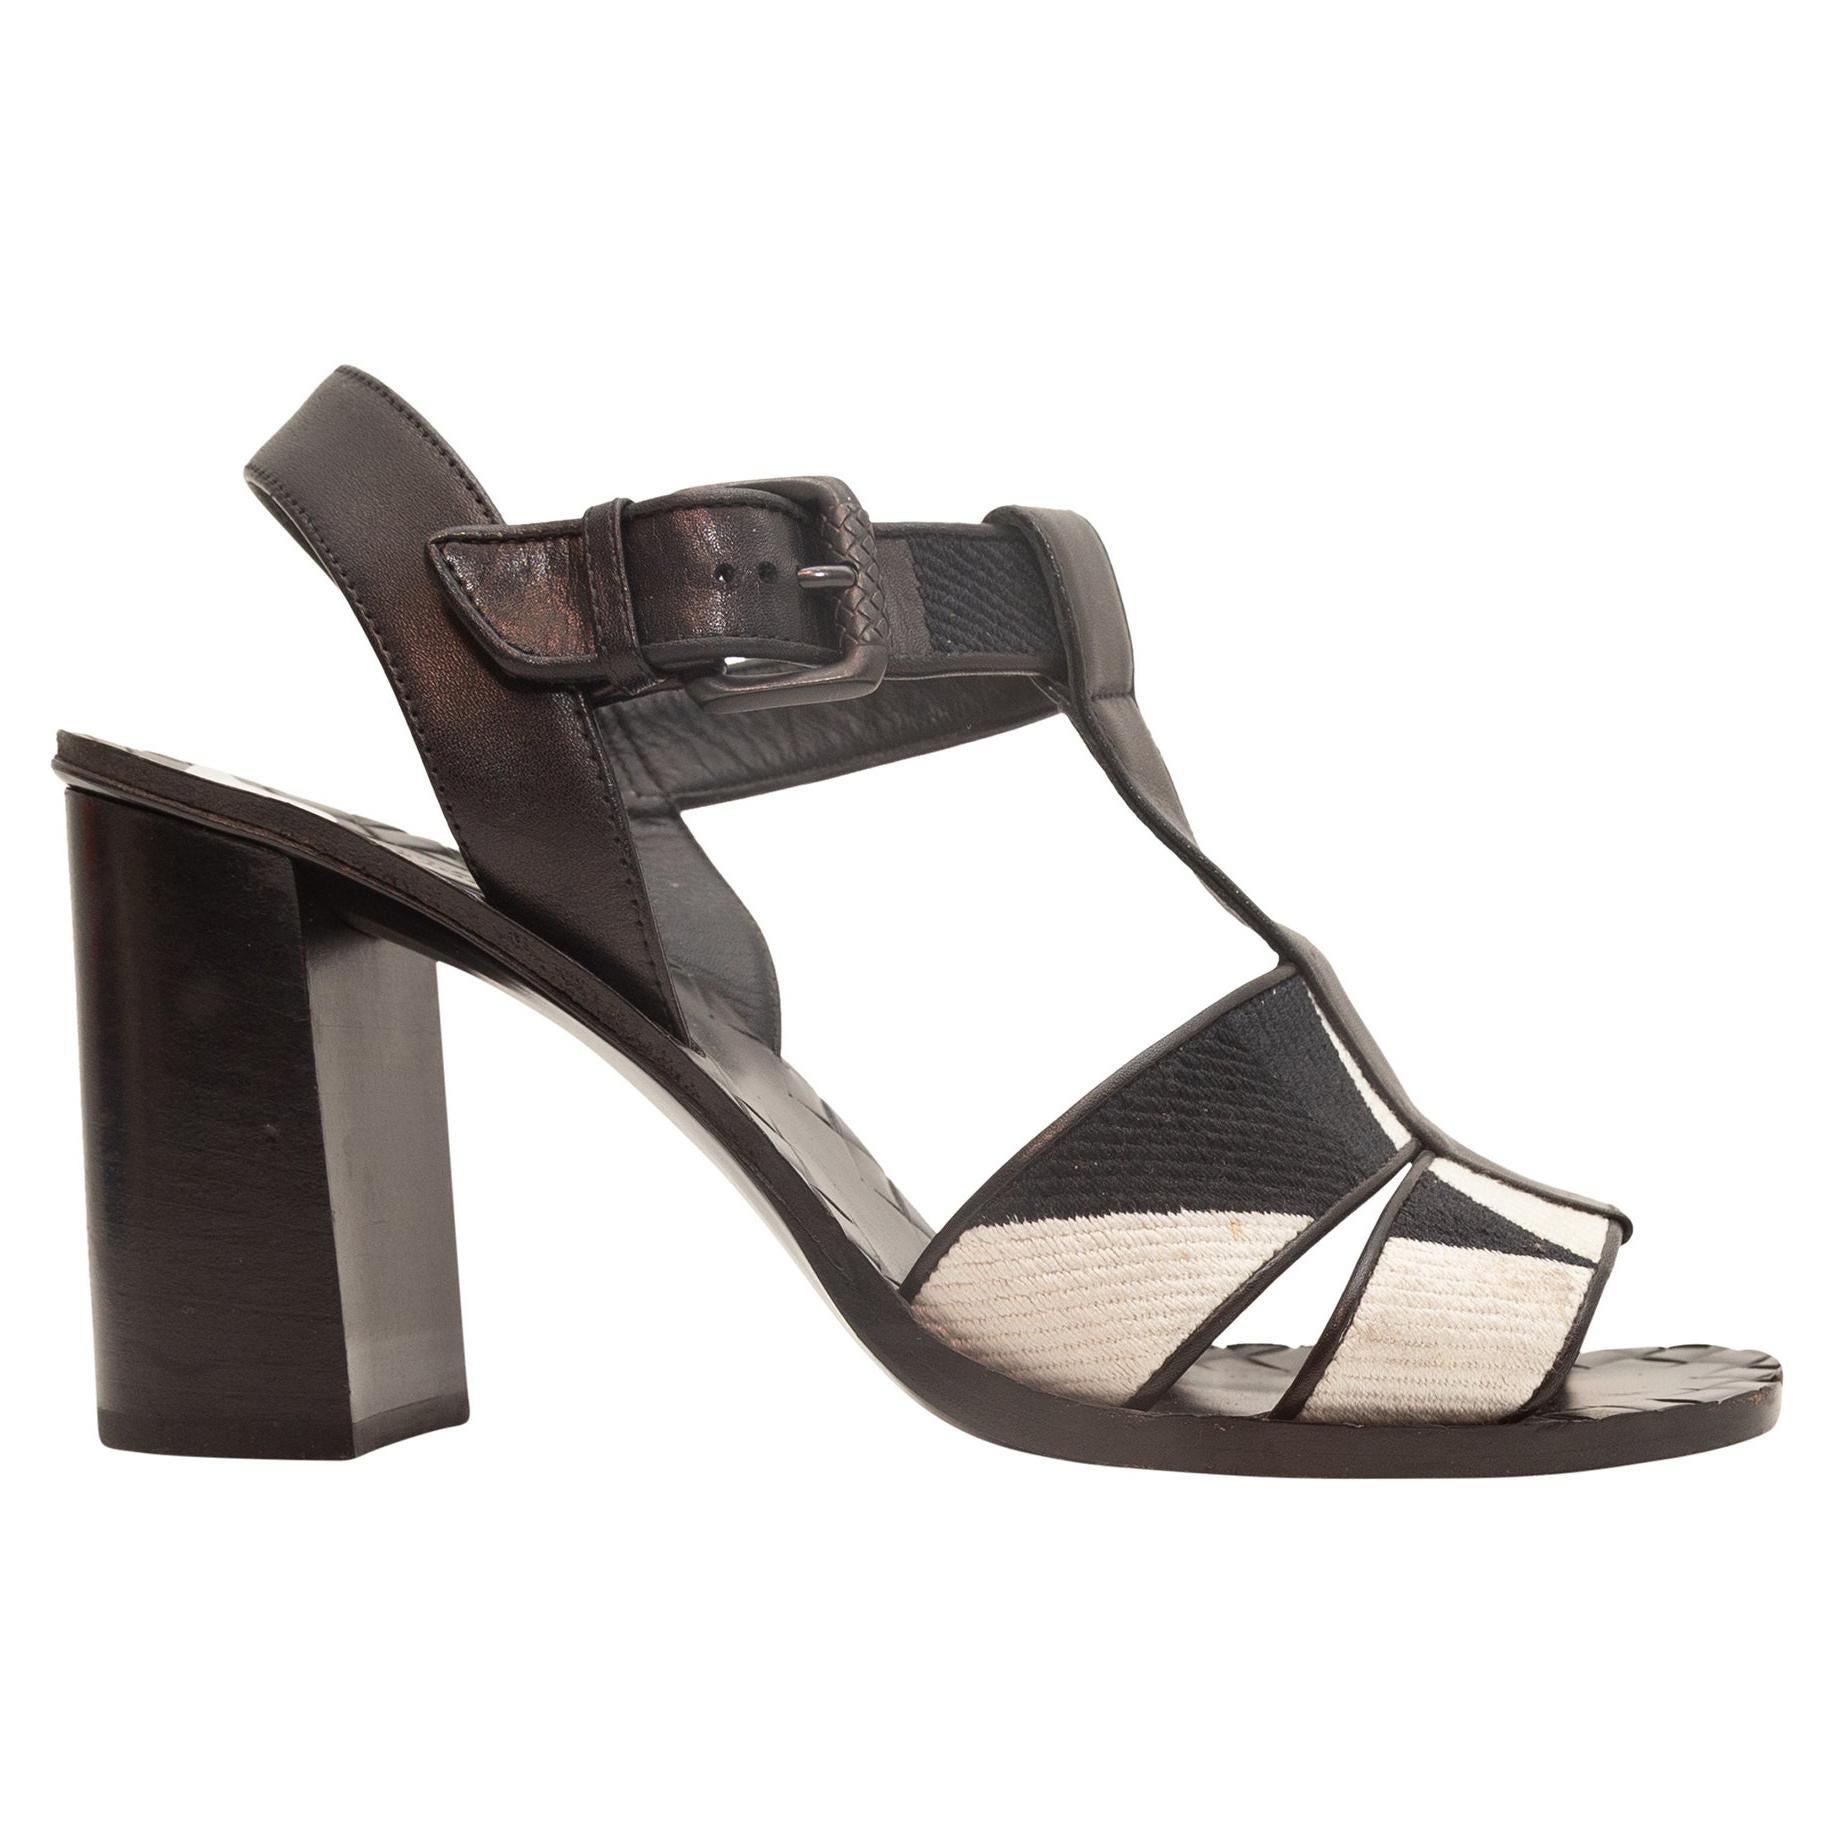 Bottega Veneta Black & White Block Heel Sandals